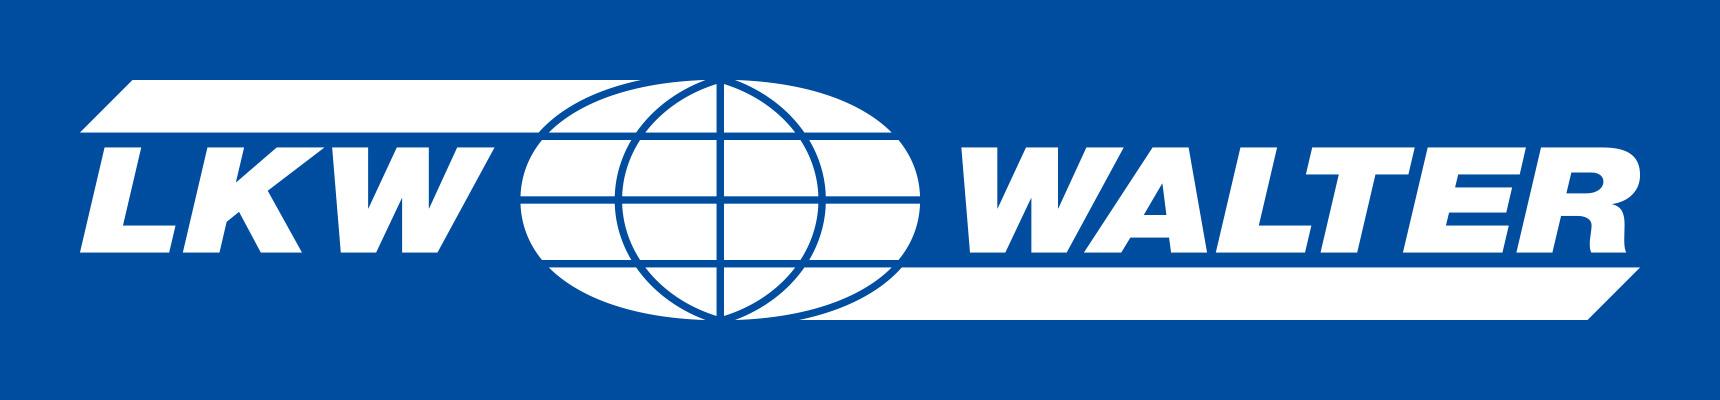 LKW-WALTER_Logo-RGB-NEG-web-72dpi_212.jpg